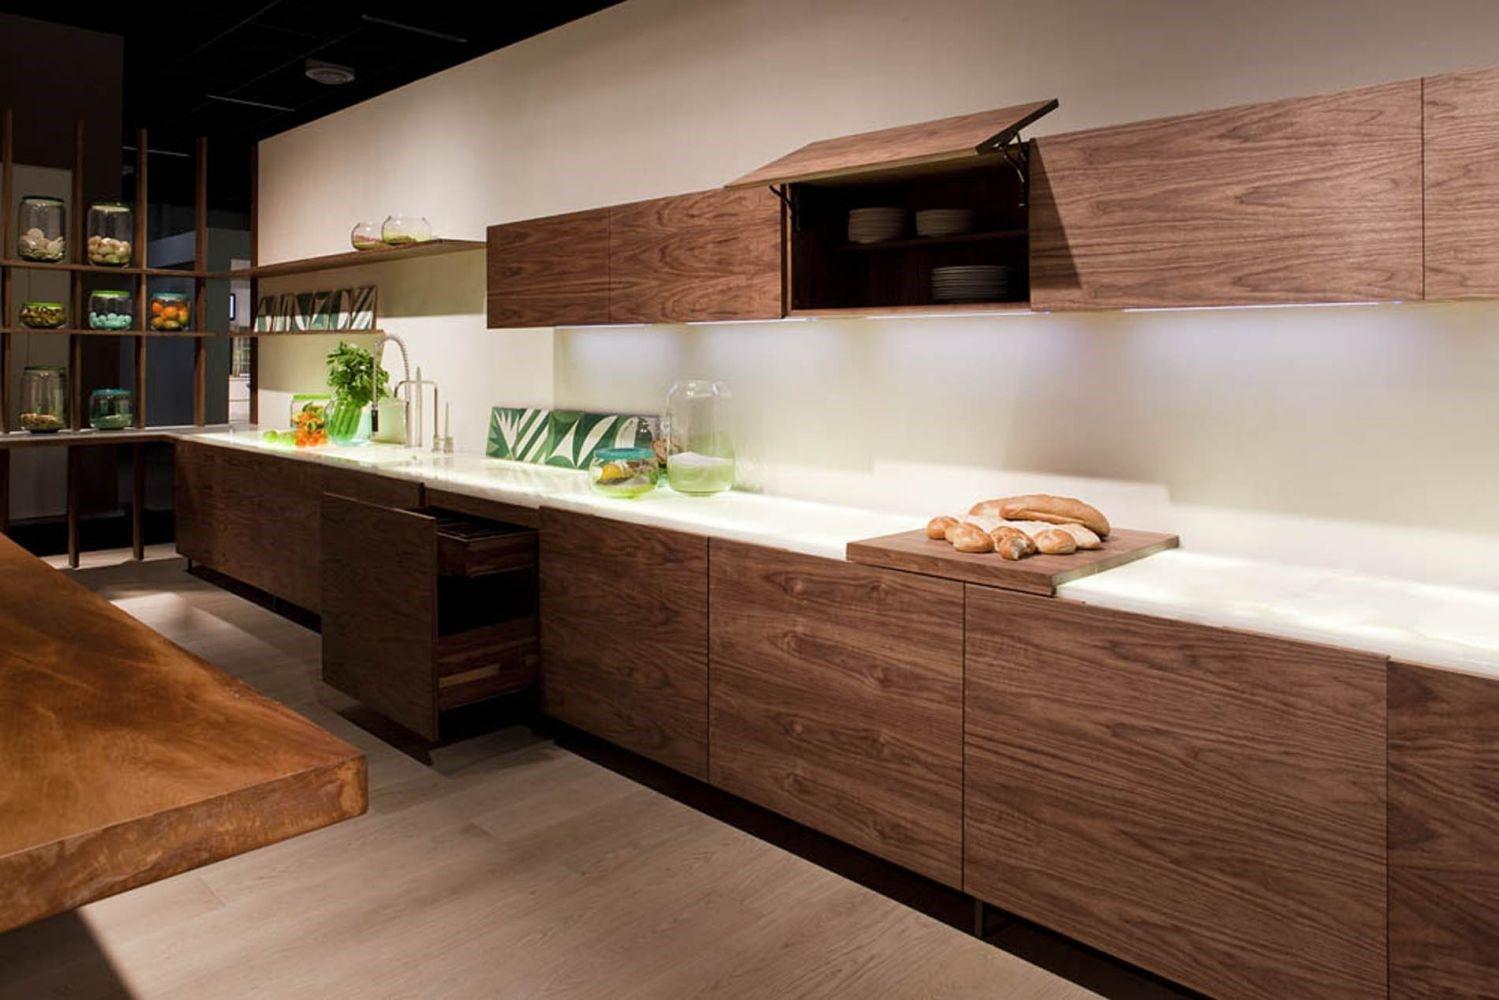 Fitted kitchen LA CUCINA By Riva 1920 design Matteo Thun